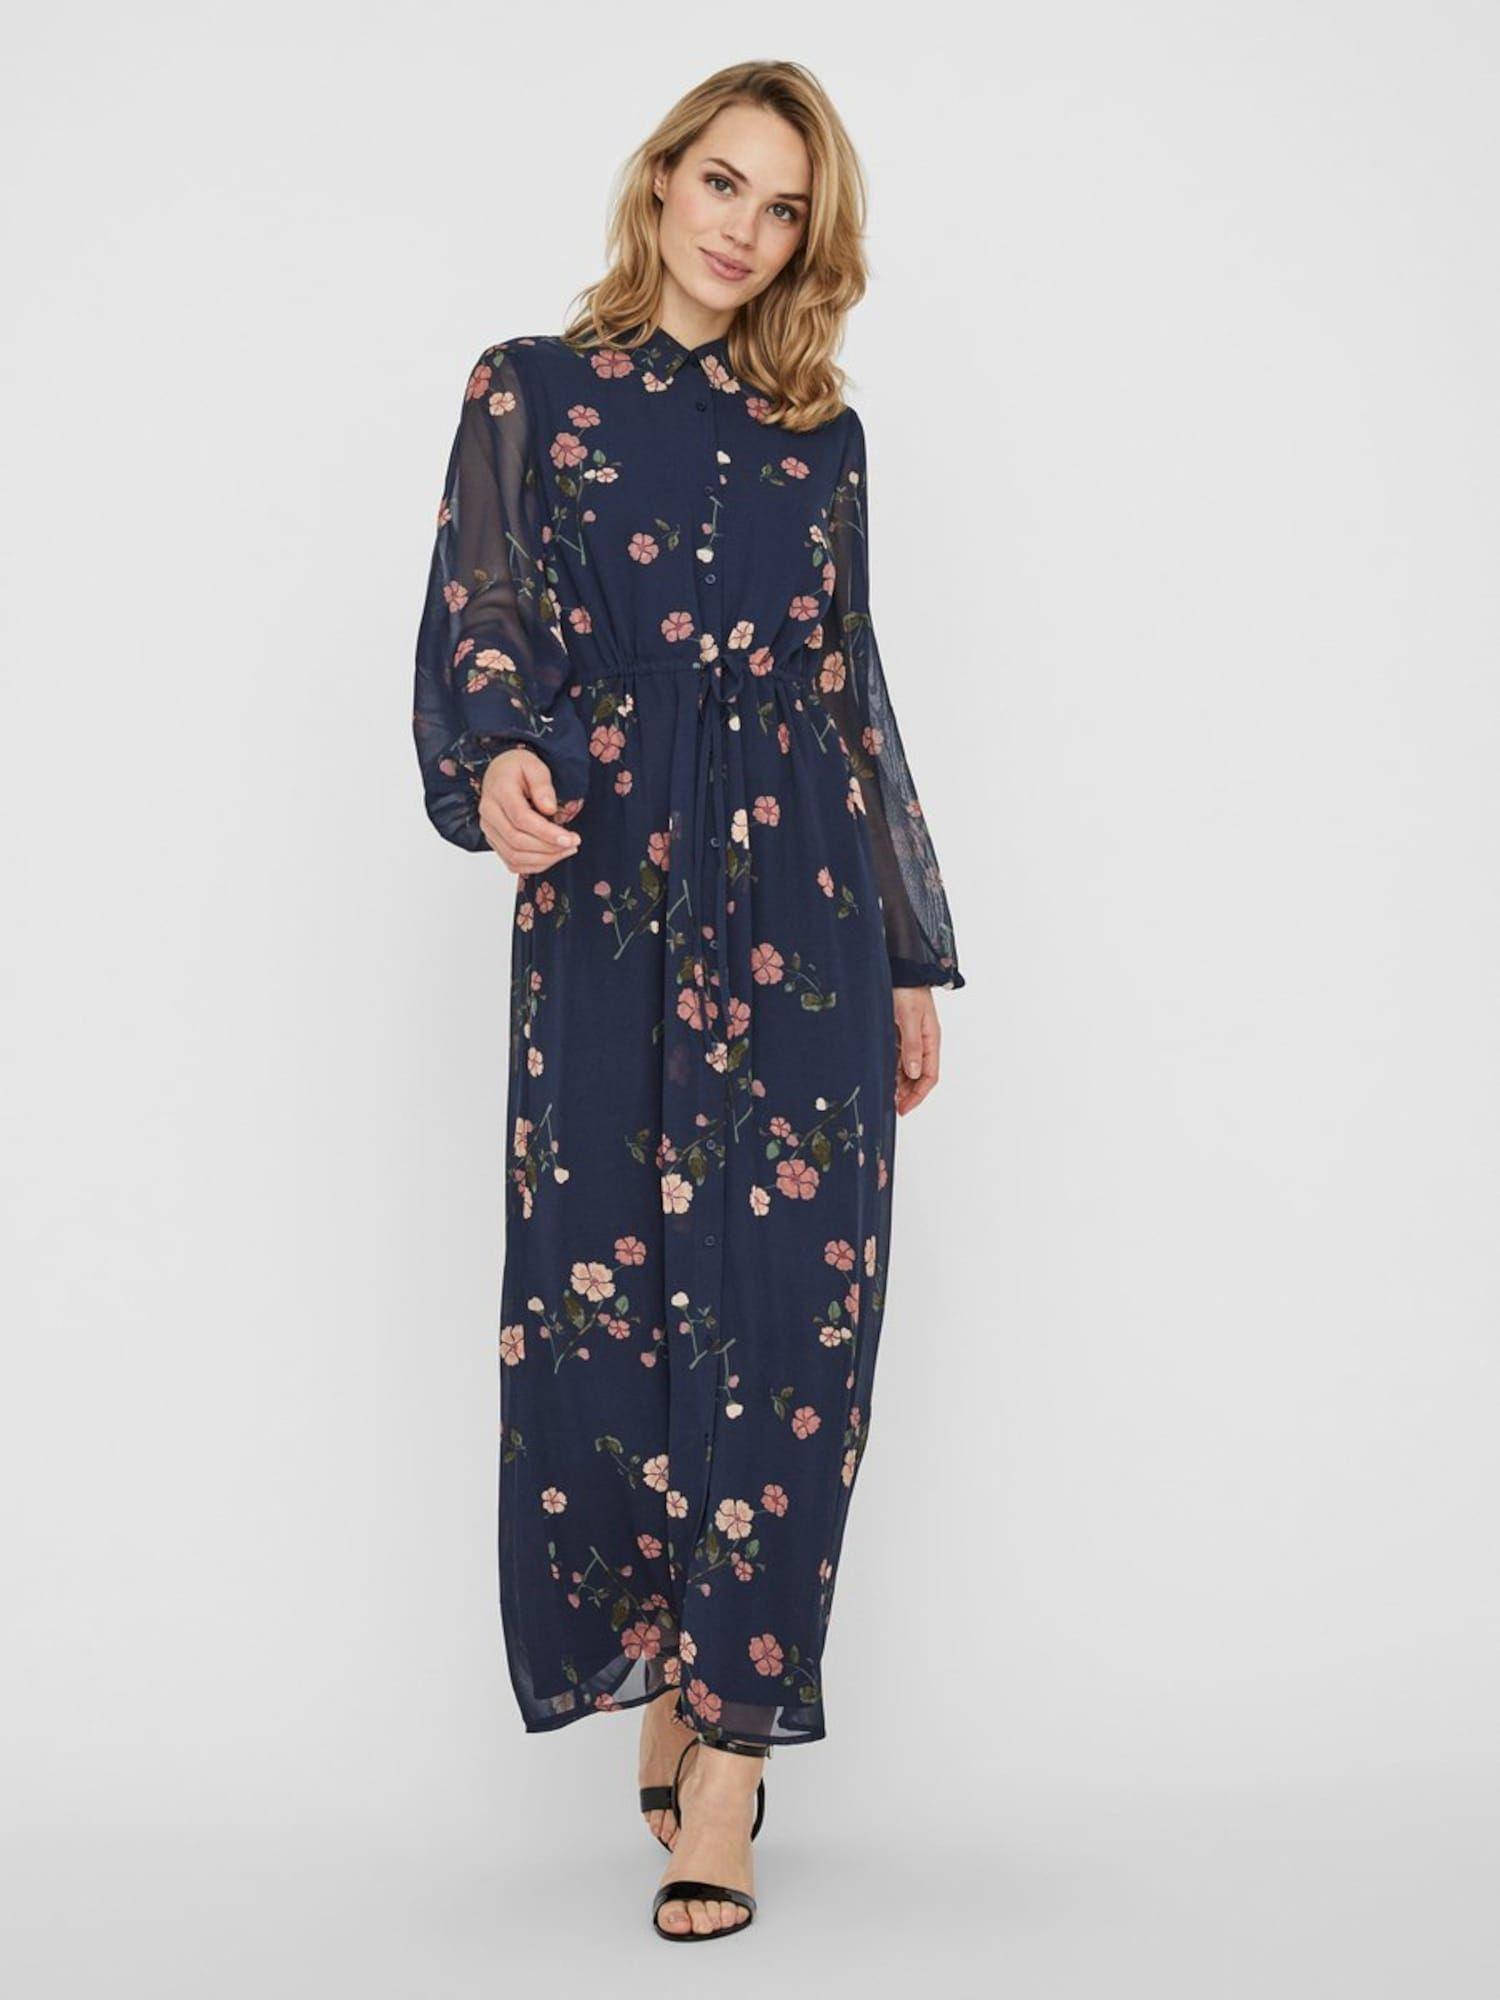 Perfekt Vero Moda Abendkleider Vertrieb13 Fantastisch Vero Moda Abendkleider Boutique